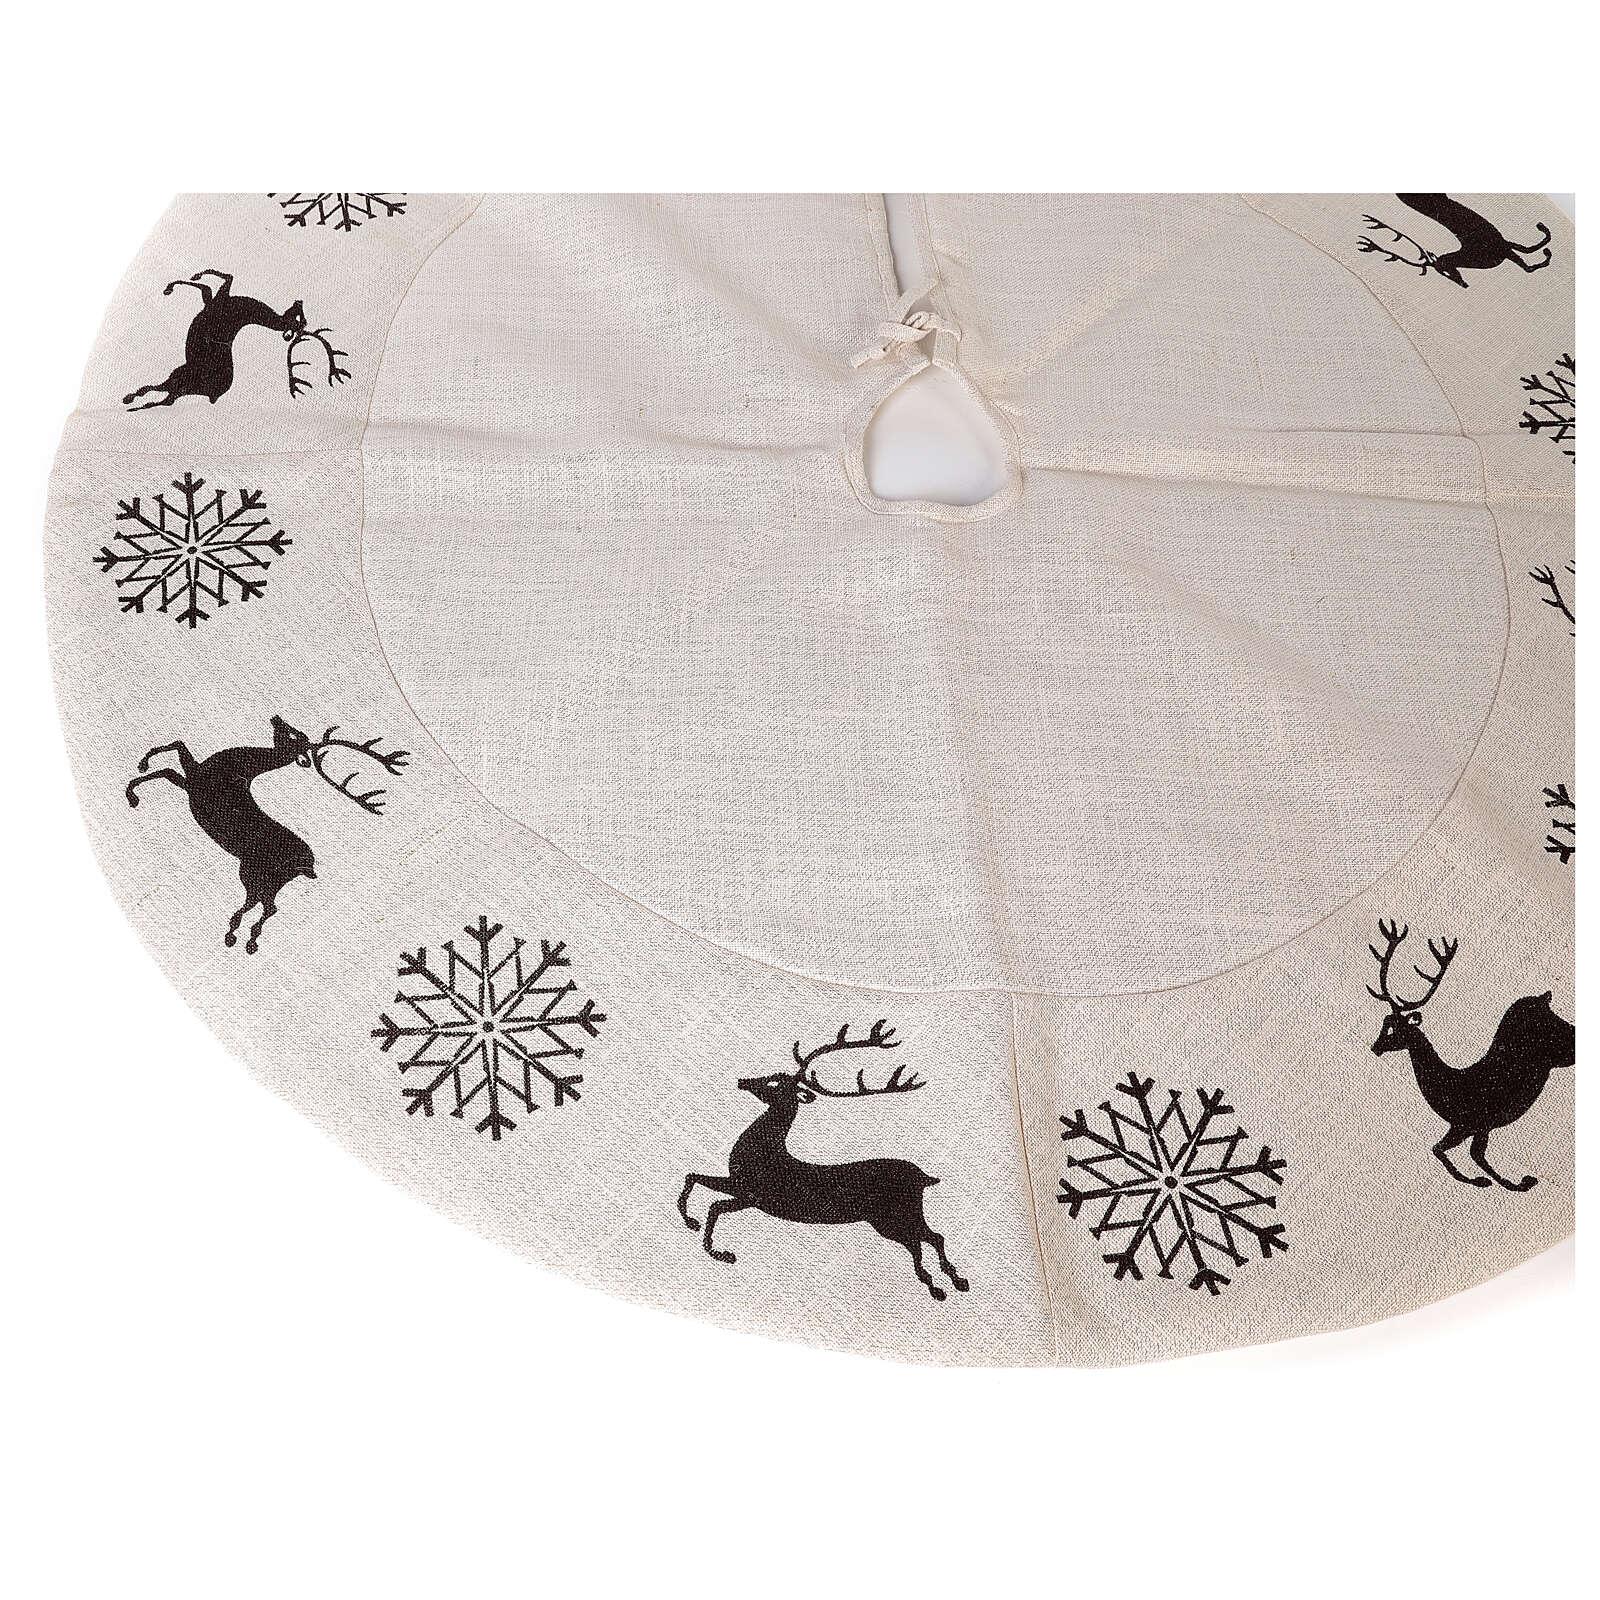 Copribase Albero Natale cervo fiocchi neve d. 1,20 cm lurex cotone 3